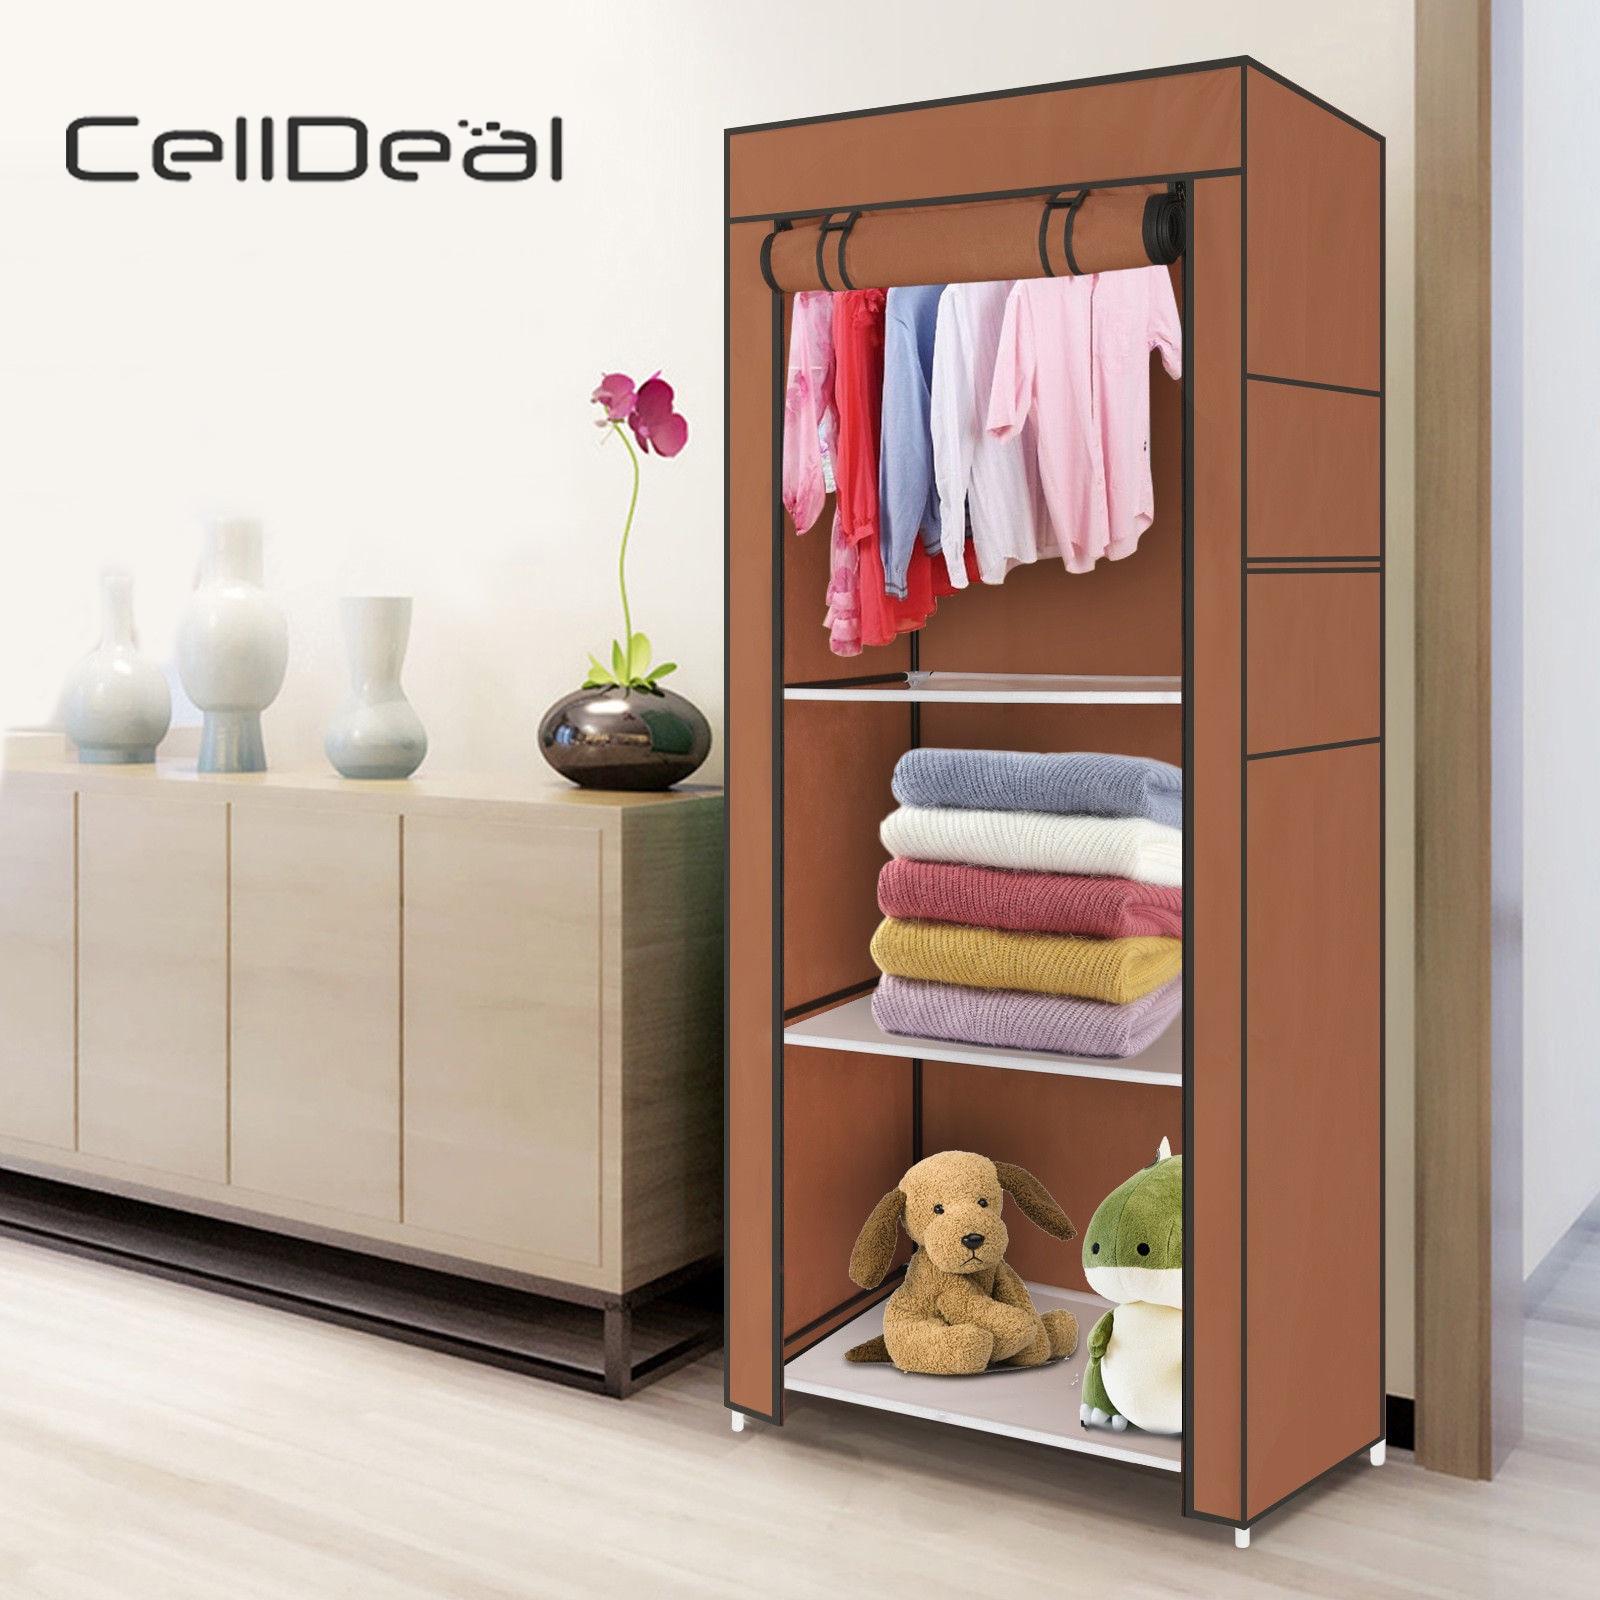 Bedrooms Single Canvas Clothes Storage Organizer Wardrobe Cupboard Shelves Cloth Storage Bedroom Furniture Closet Storage